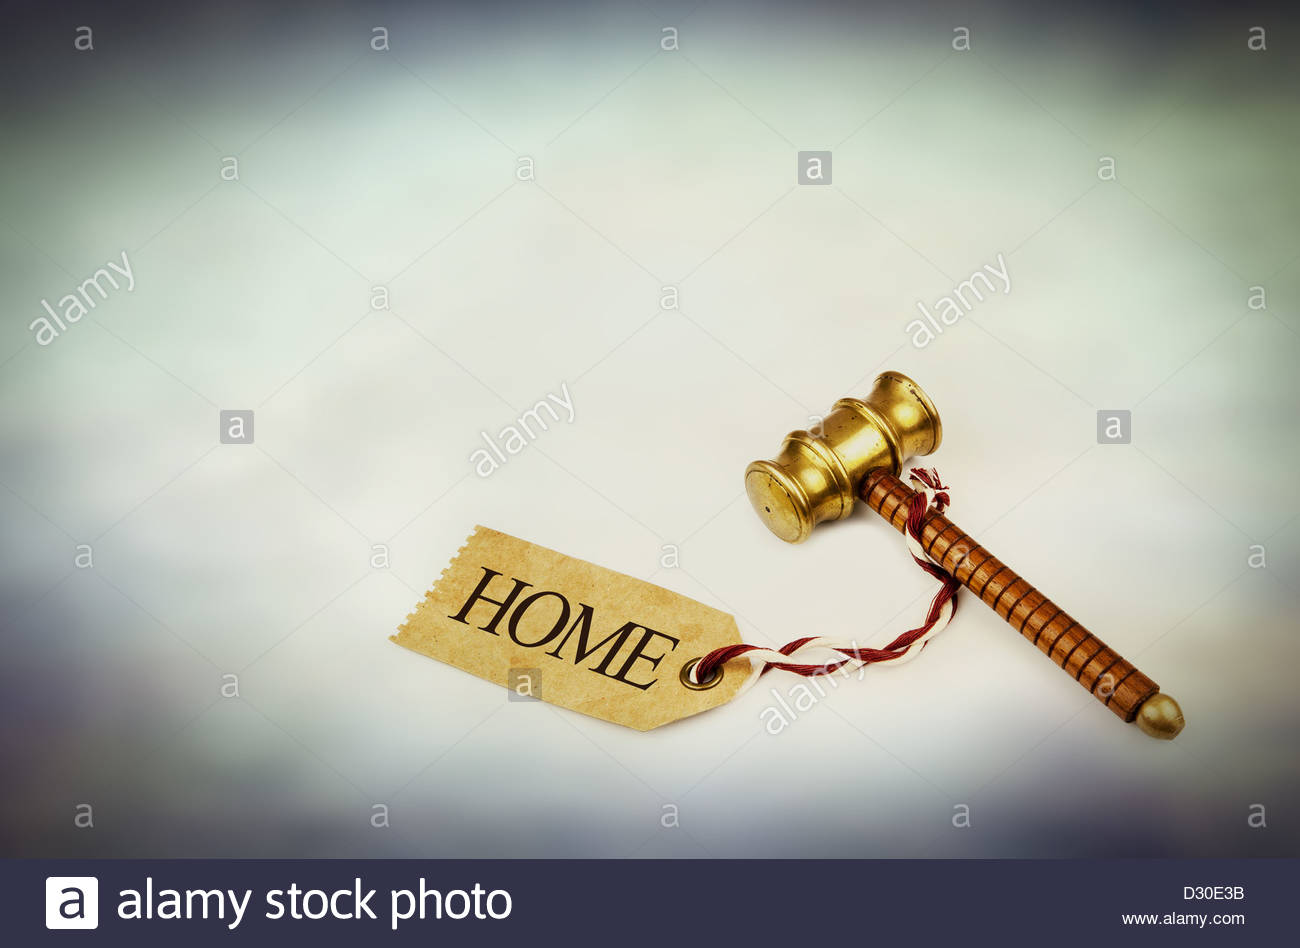 property auction - Stock Image